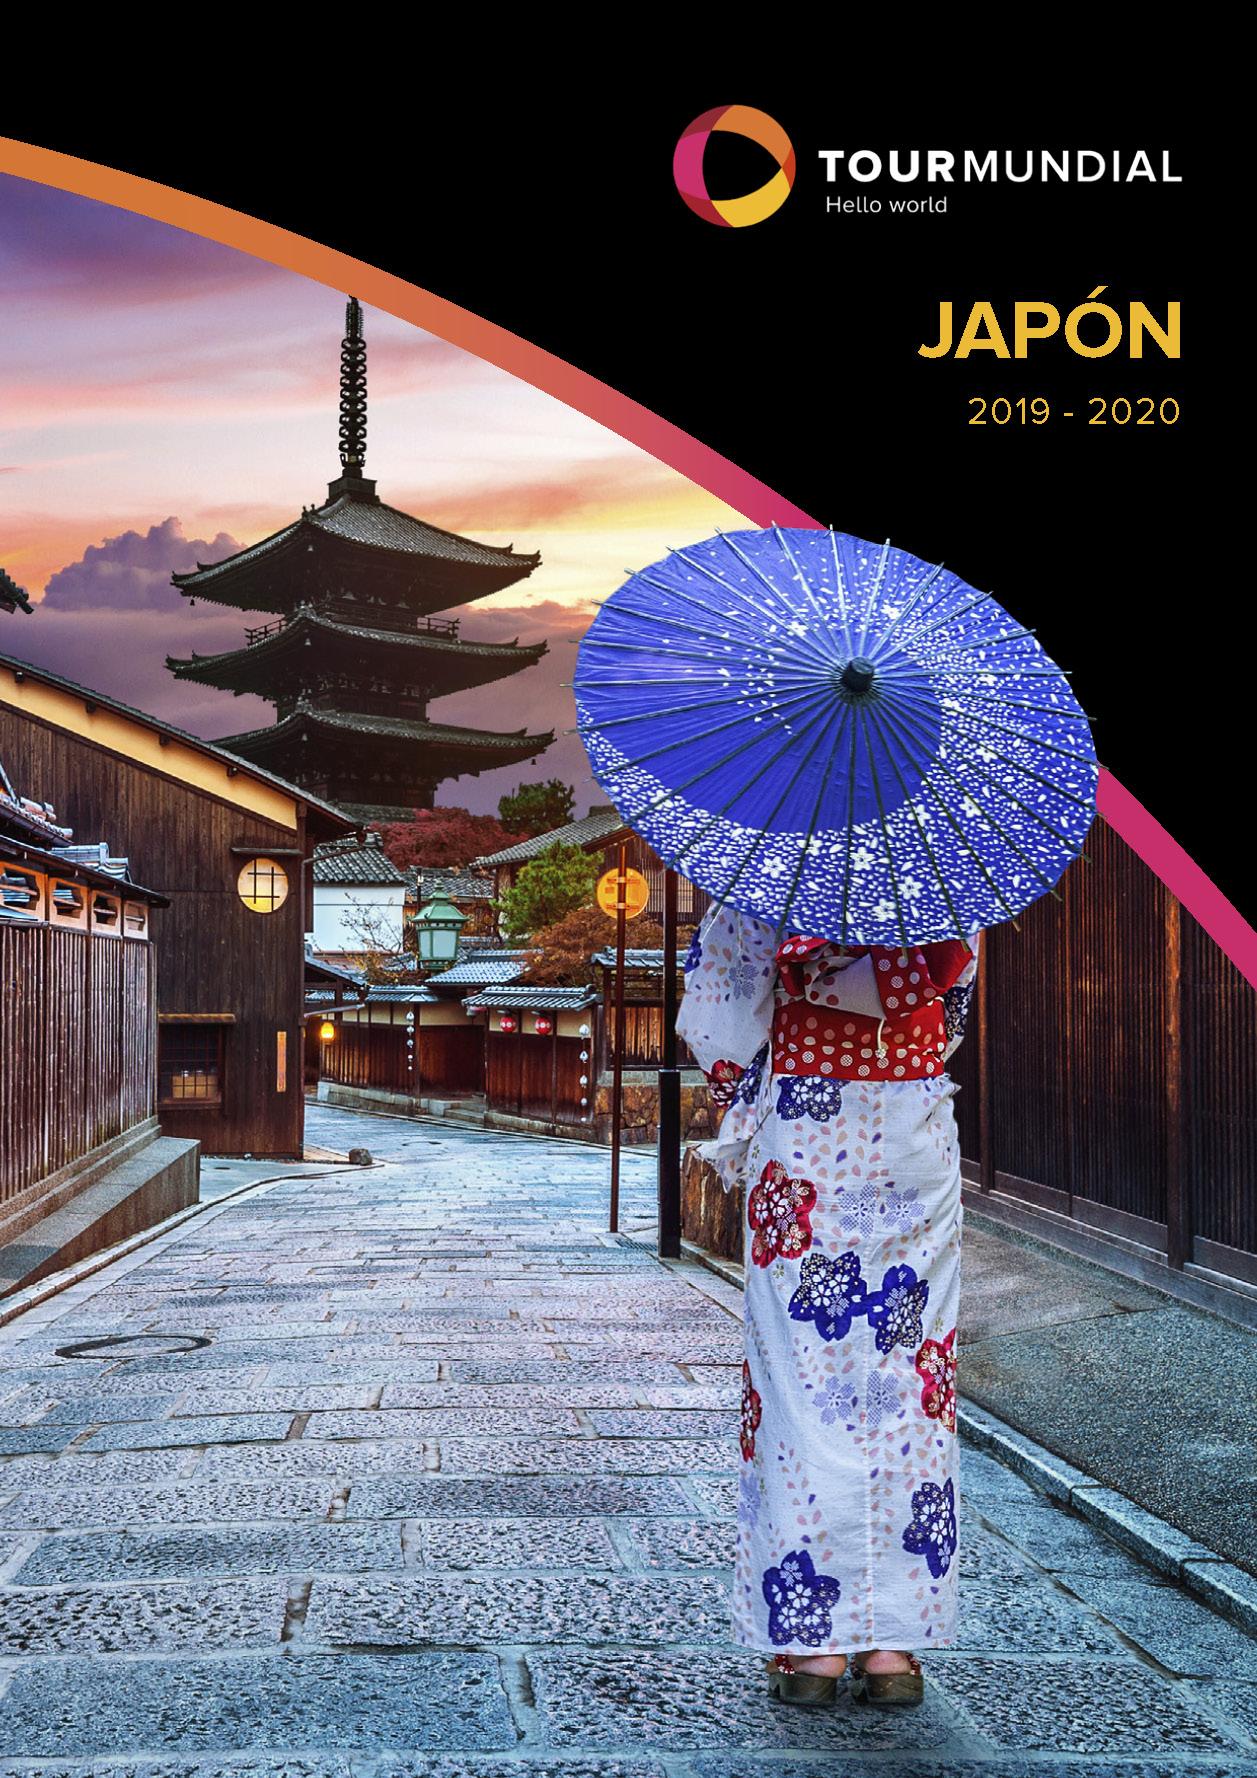 Catálogo Tourmundial Japón 2019-2020